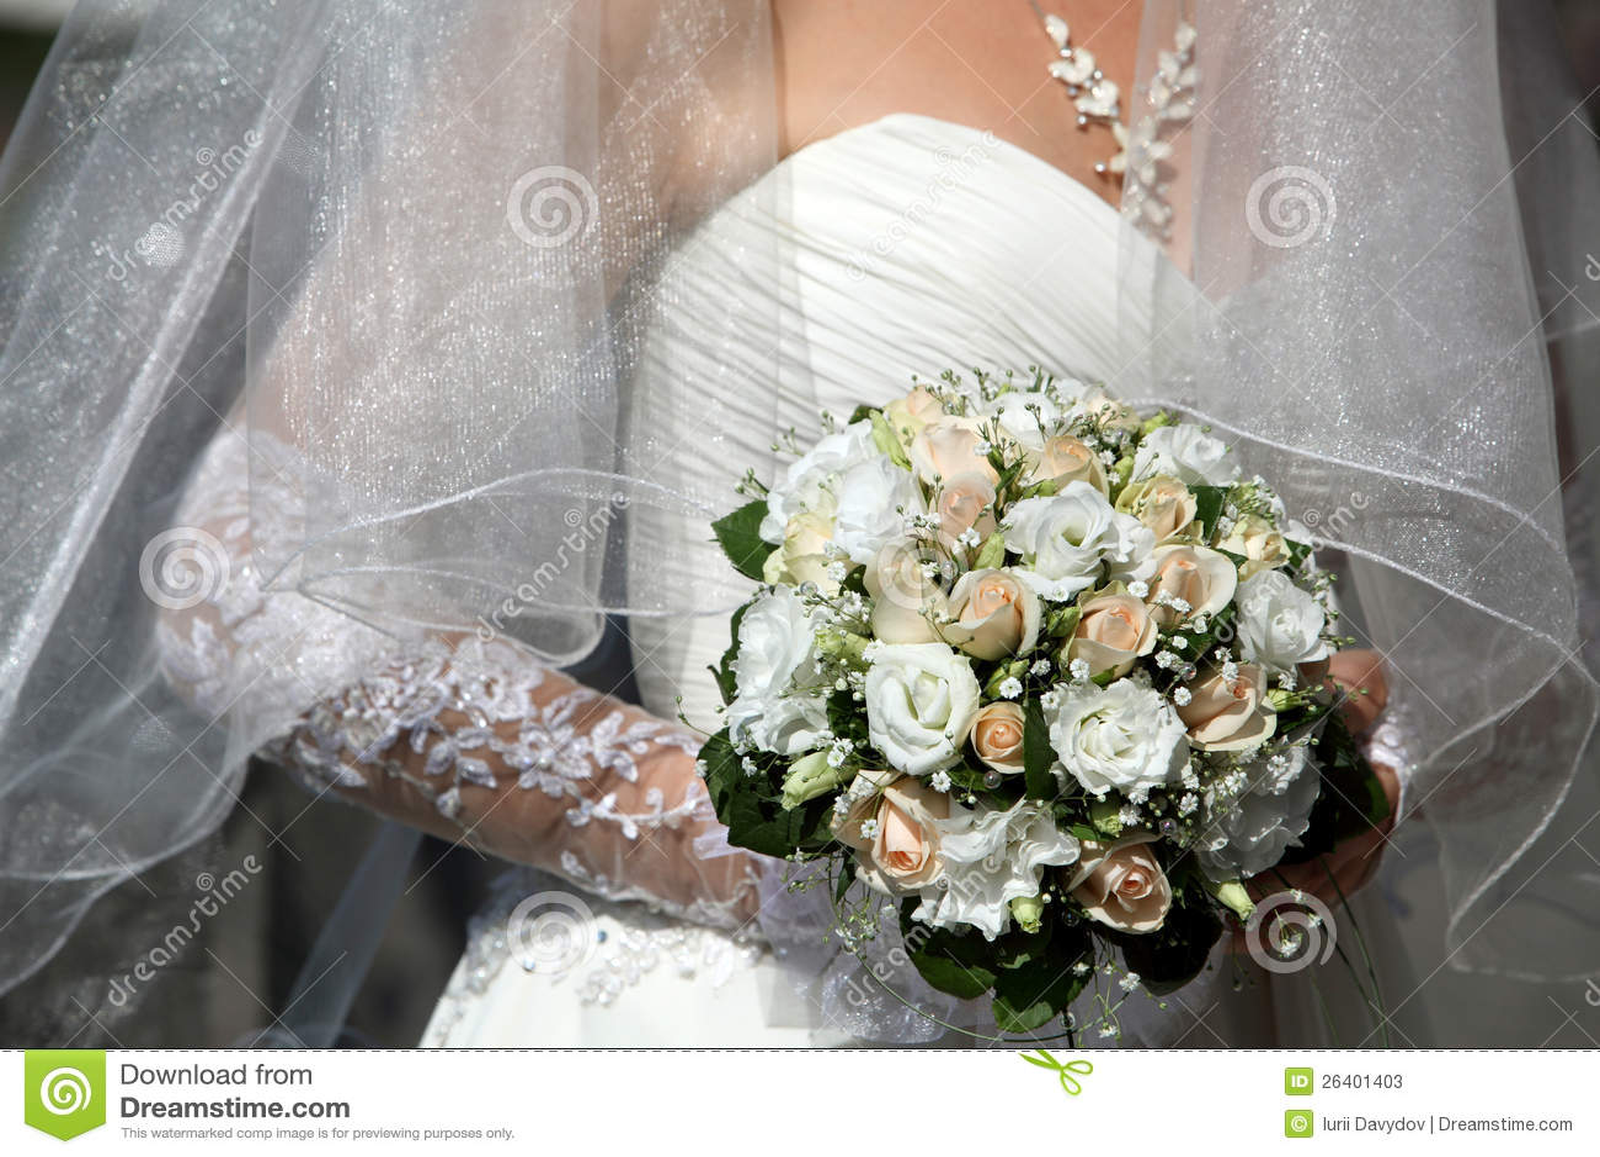 Bride holding beautiful wedding flowers bouquet stock image image bride holding beautiful wedding flowers bouquet izmirmasajfo